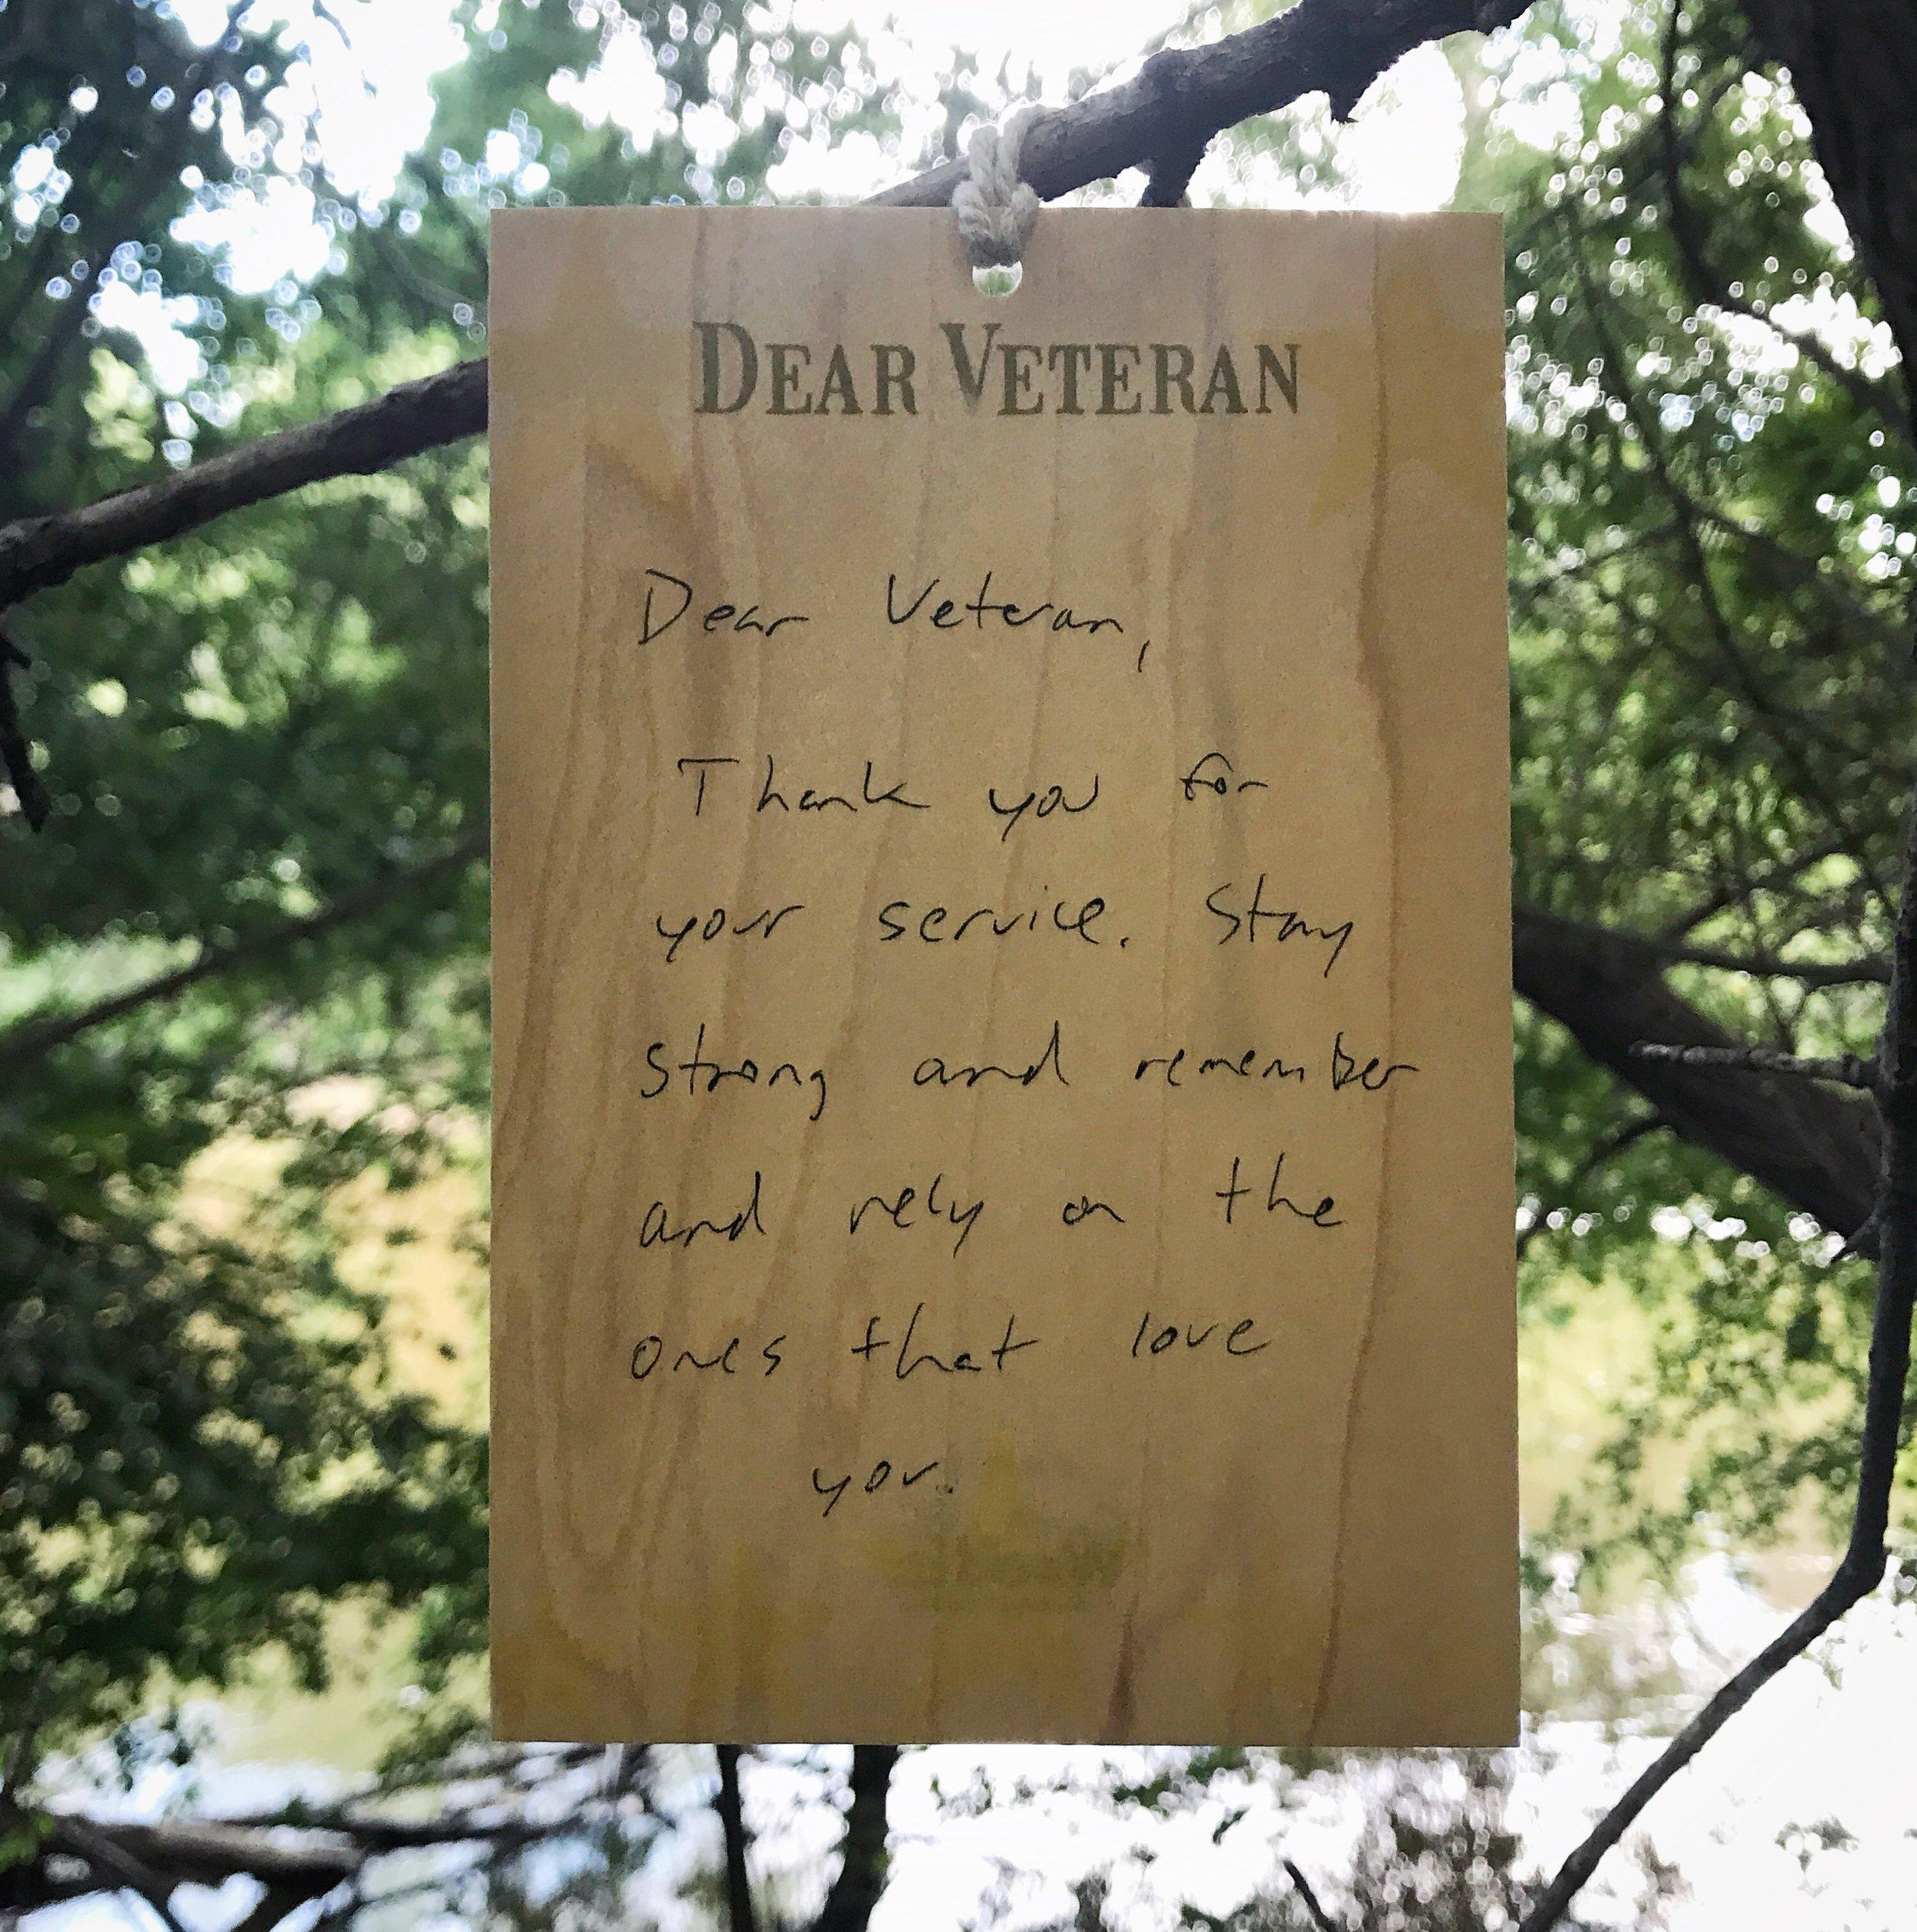 DearVeteran_AUG20_2017.JPG